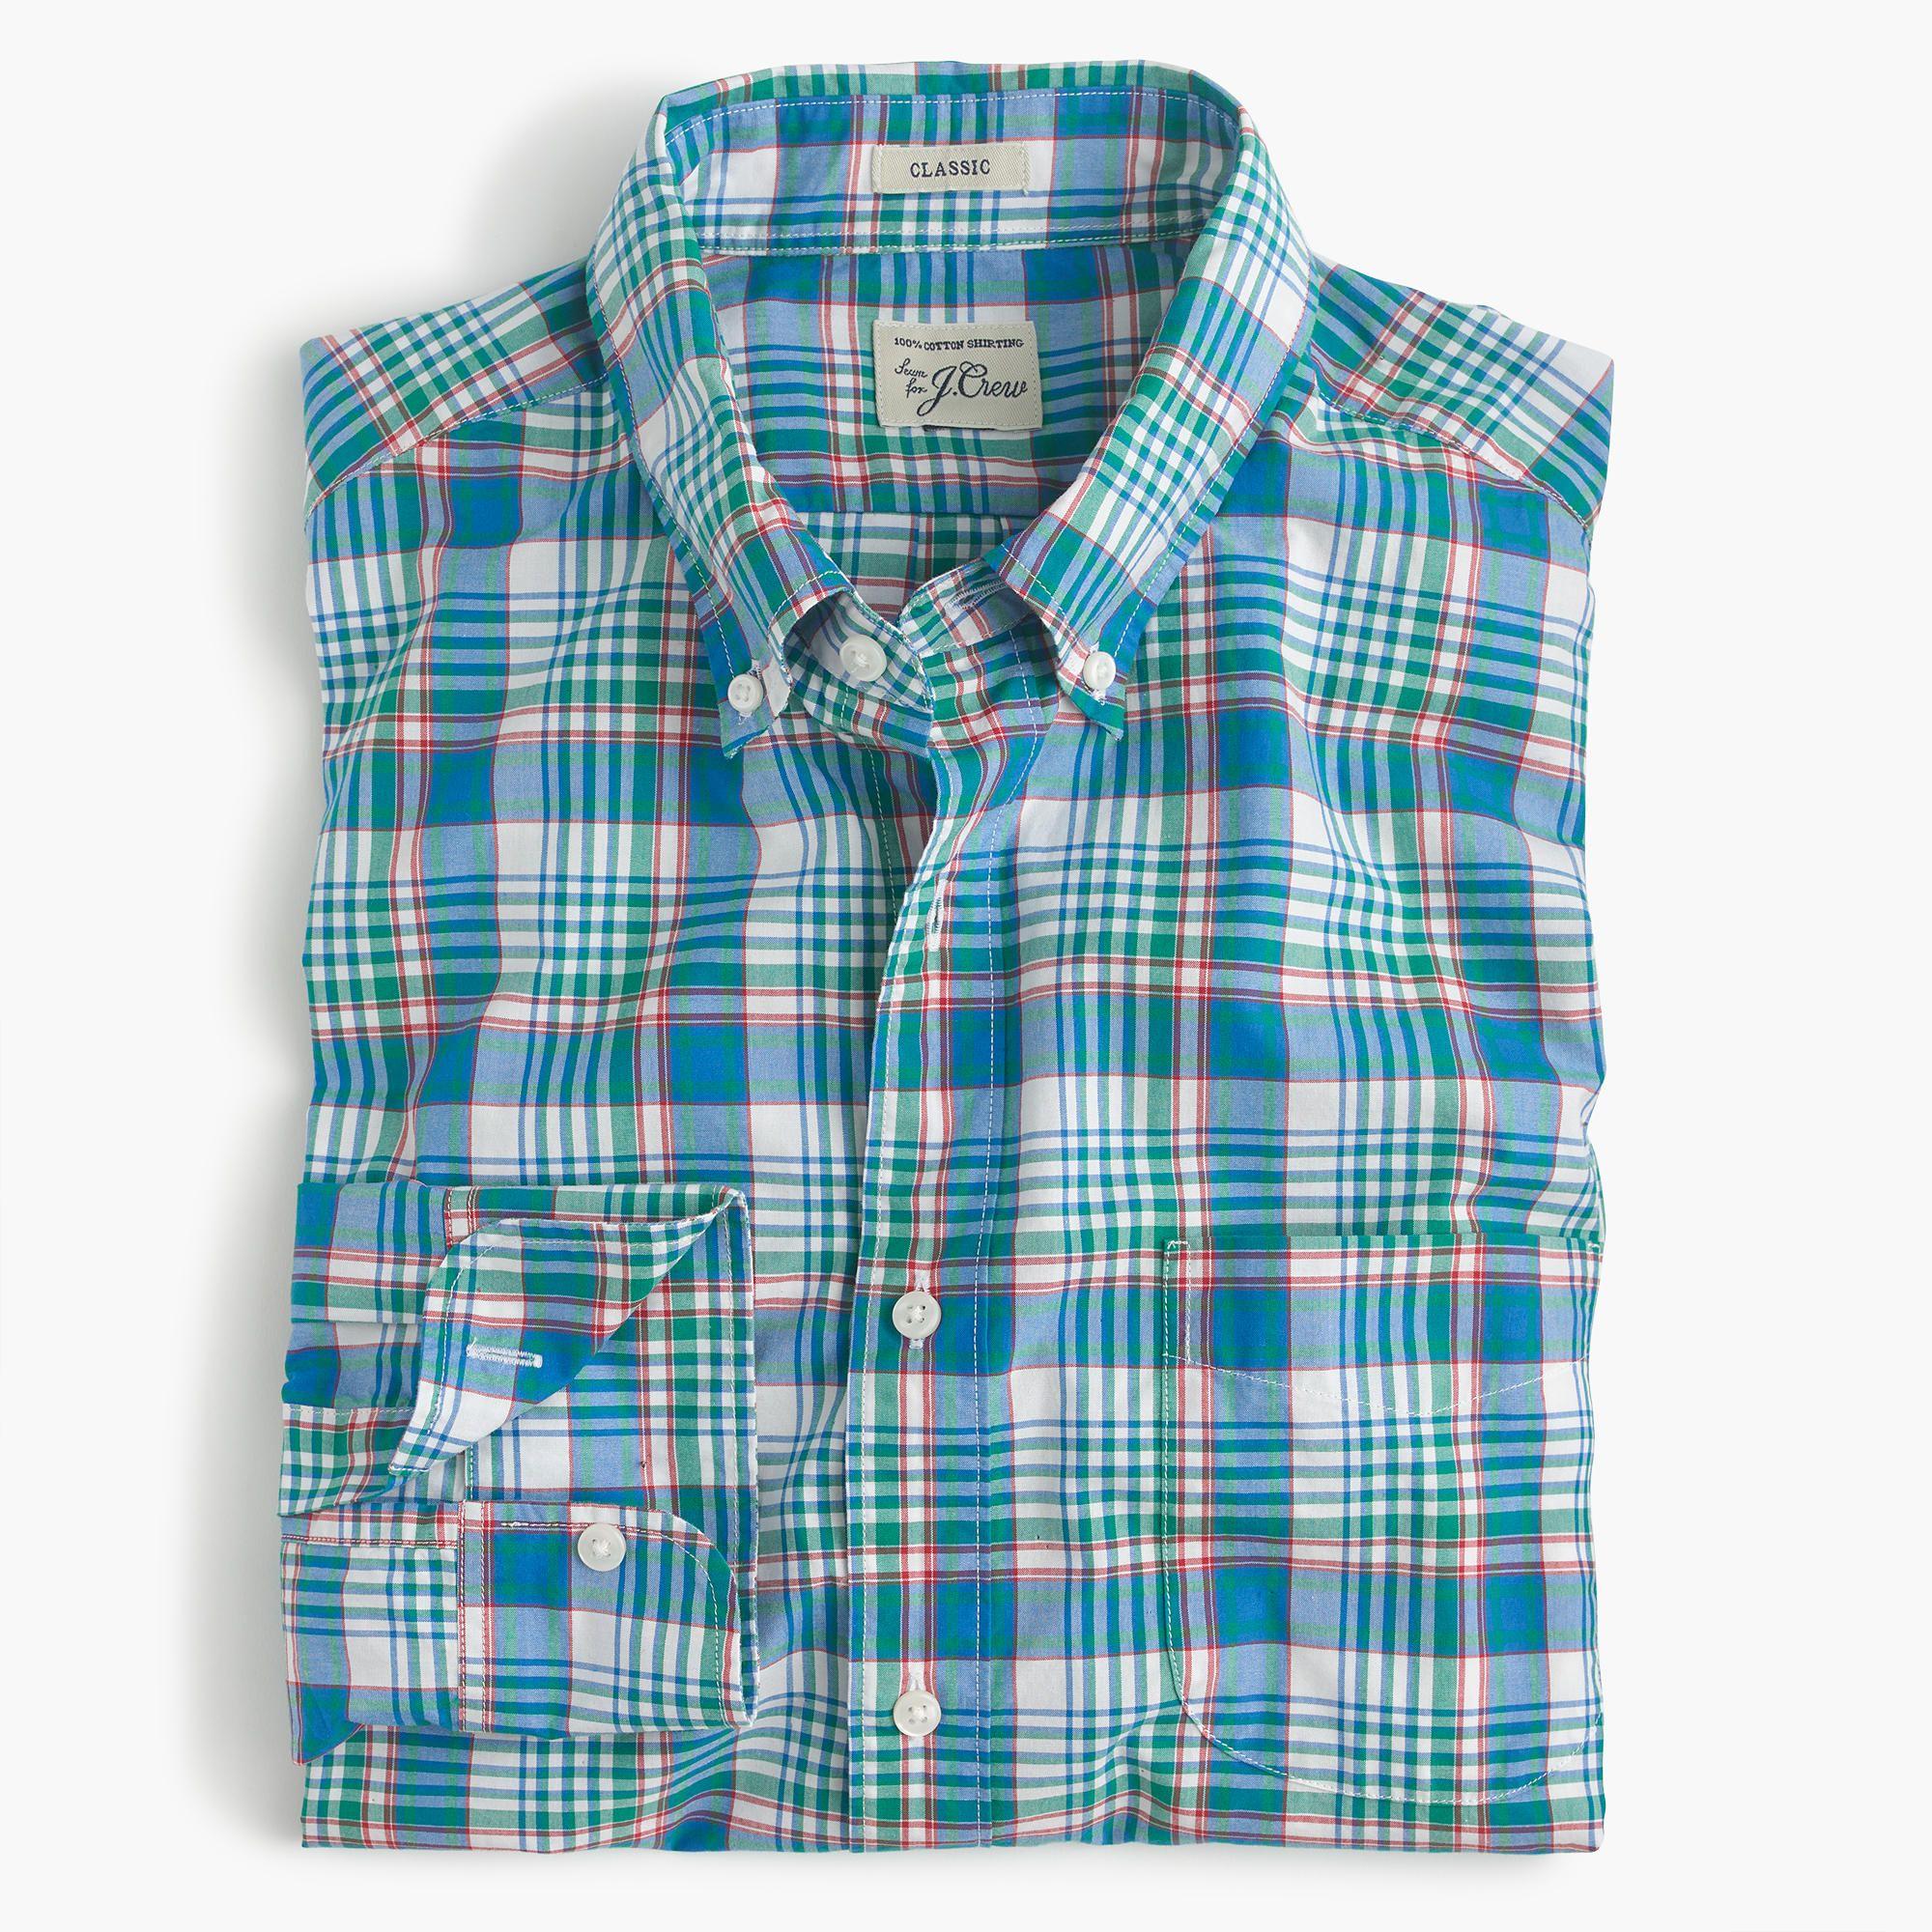 fd06520e J.Crew - Secret Wash shirt in light blue plaid | Men's Fashion